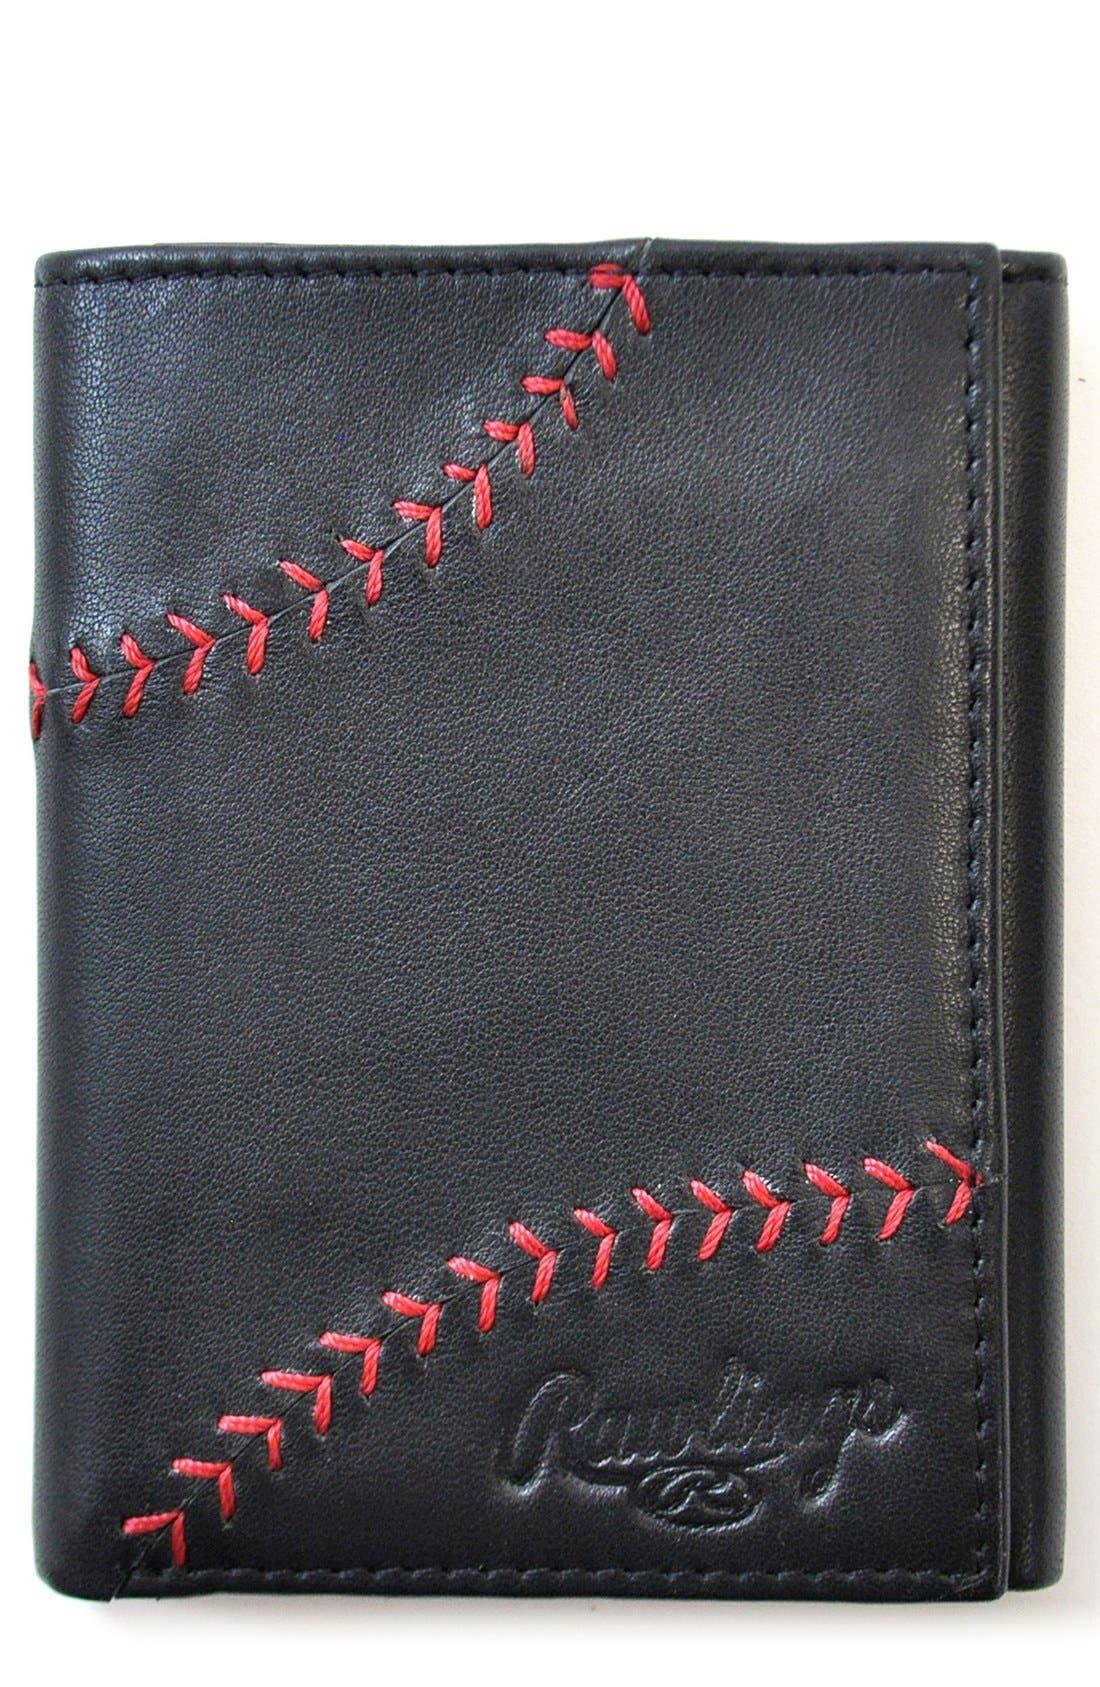 Main Image - Rawlings® Baseball Stitch Leather Trifold Wallet